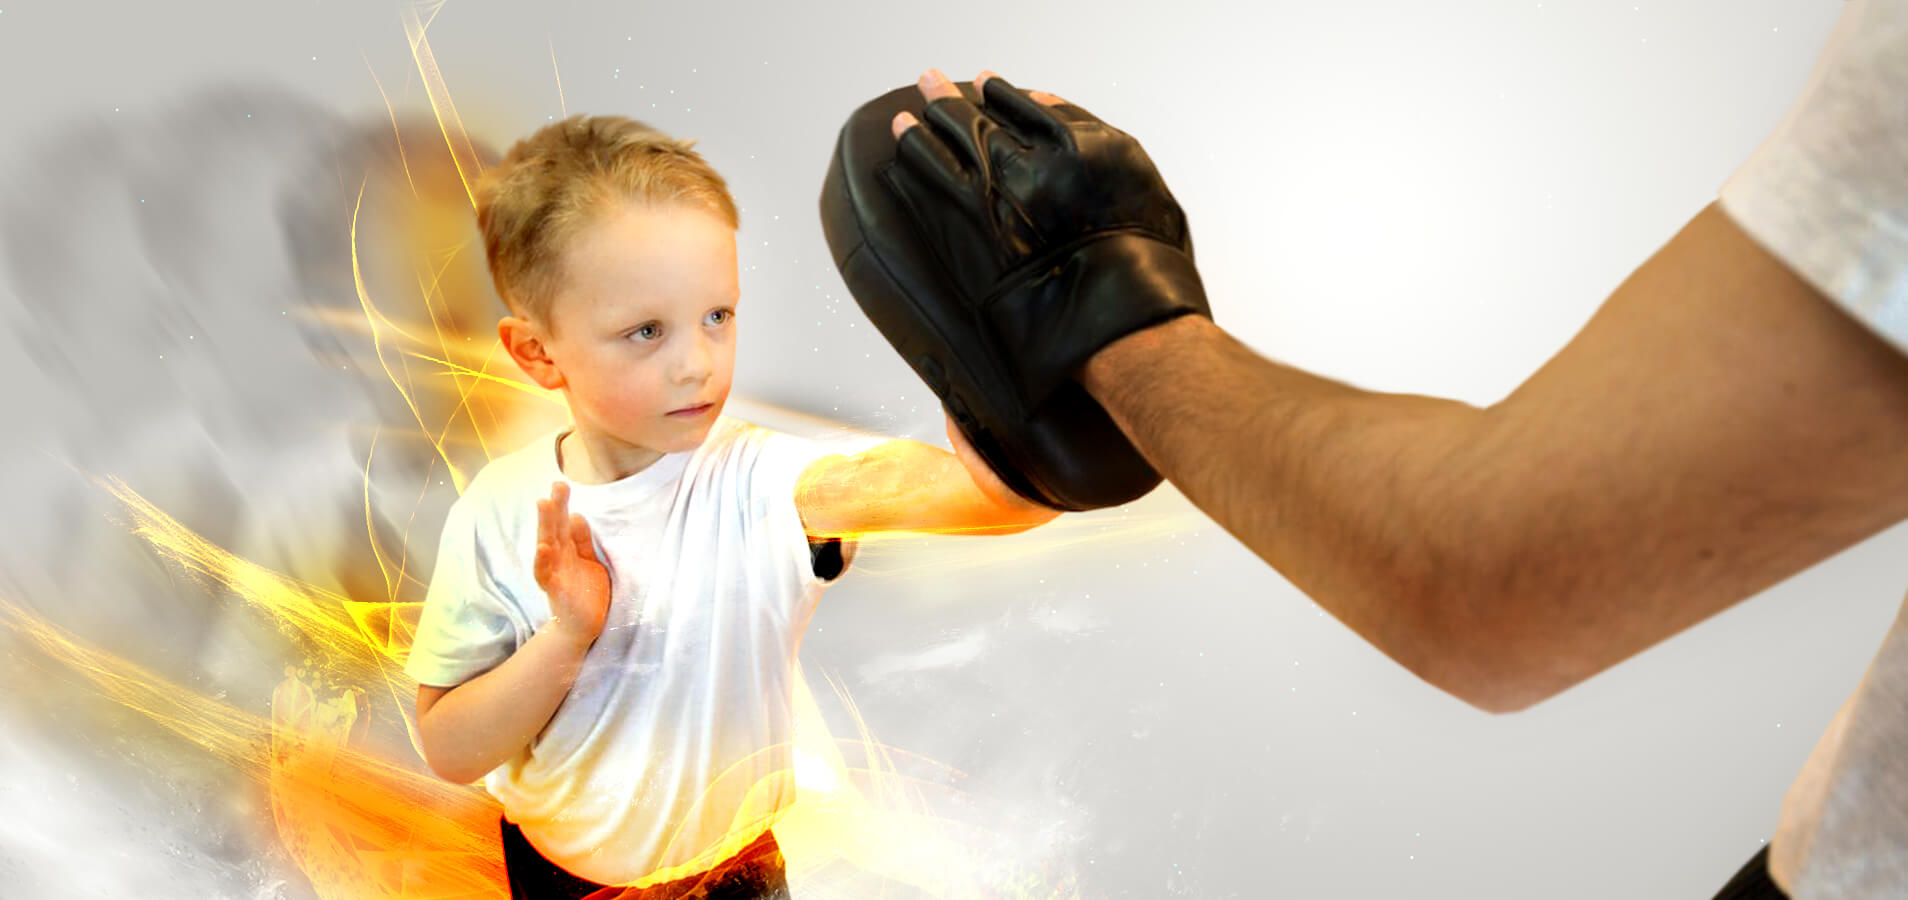 Kung Fu, Karate für Kinder, Ludwigsburg, Stuttgart, Esslingen, Waiblingen, Bad Cannstatt